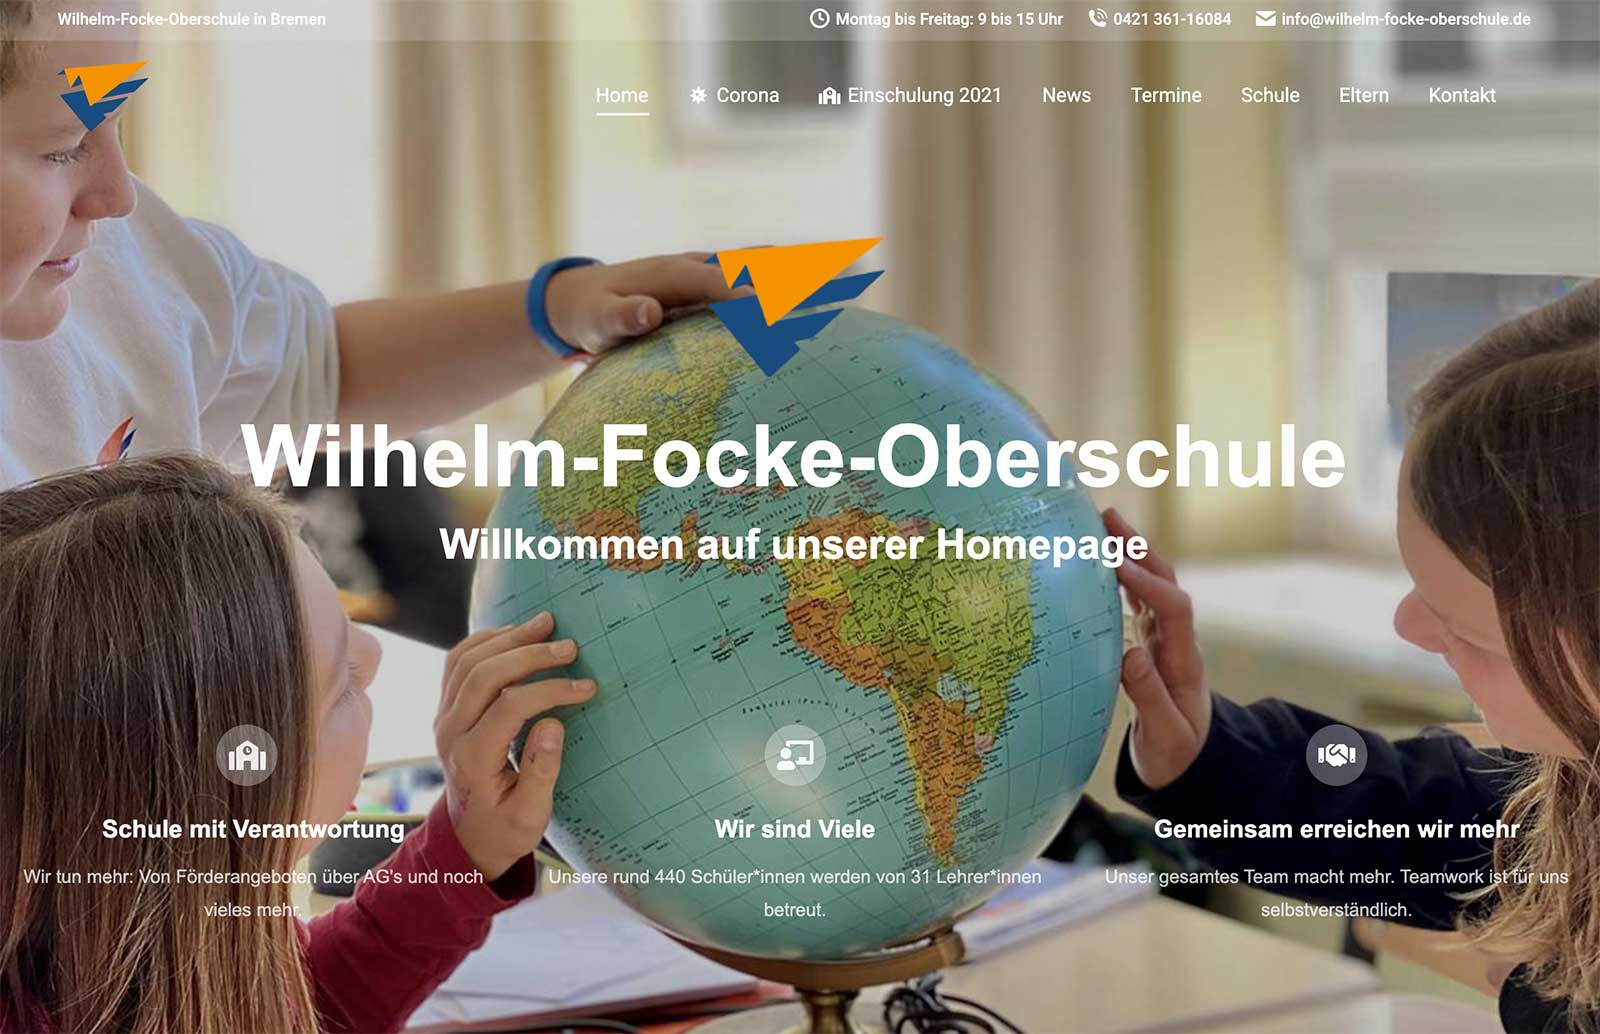 Wilhelm-Focke-Oberschule - Neue Homepage